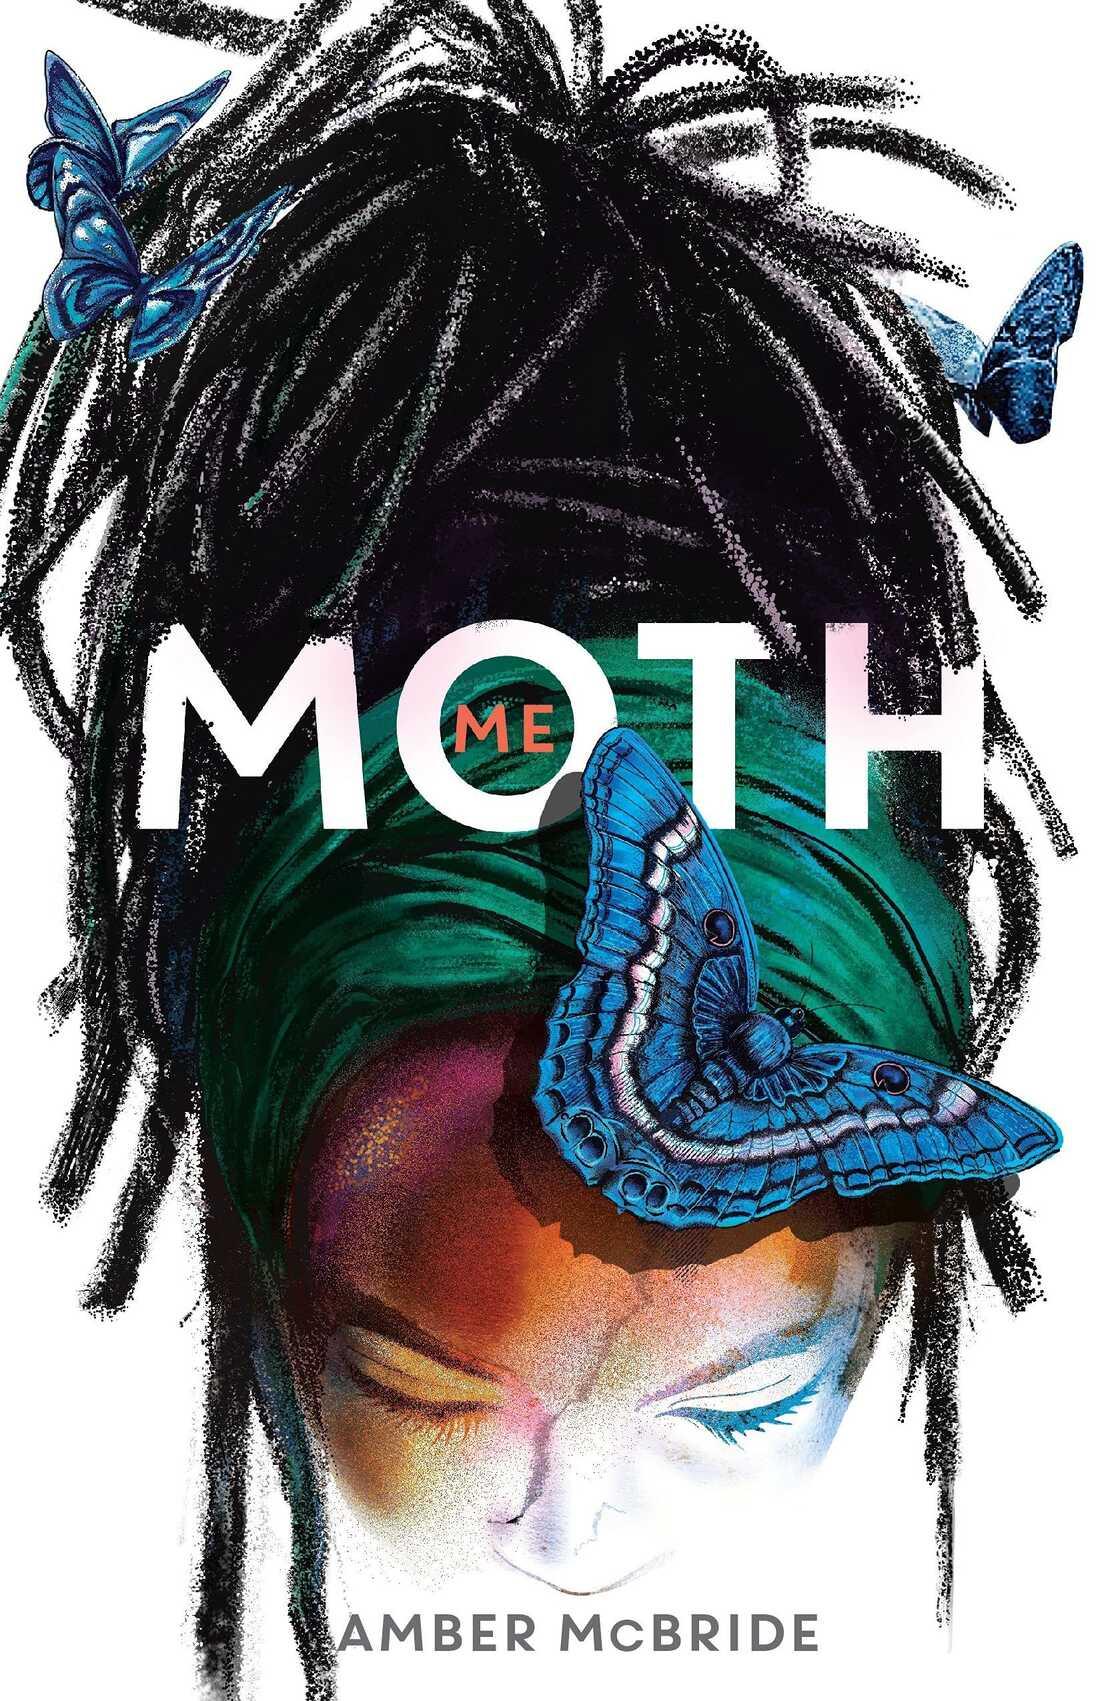 Me (Moth), by Amber McBride